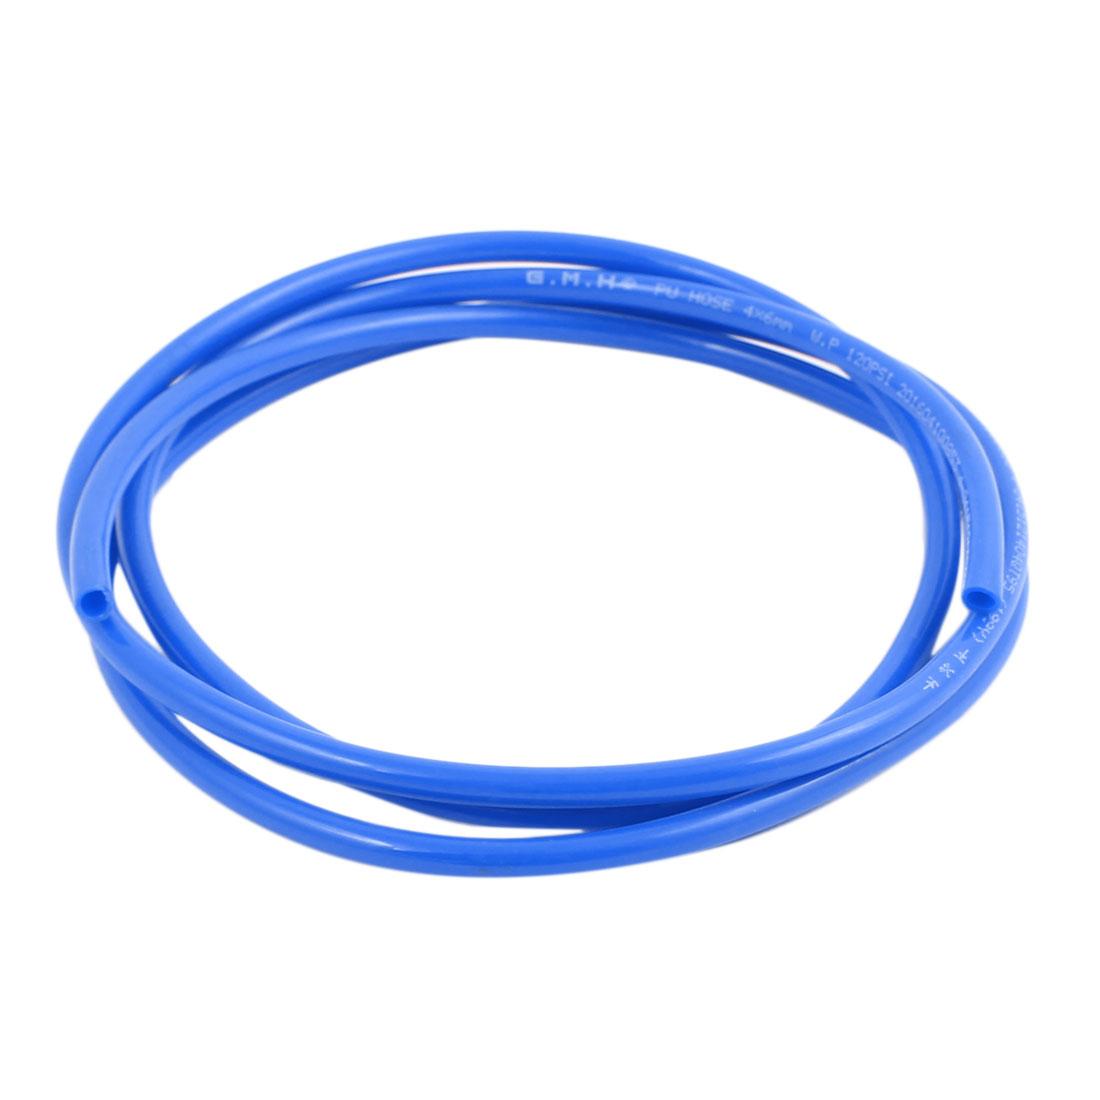 6mm x 4mm Pneumatic Air Compressor Tubing PU Hose Tube Pipe 1.5 meter Blue